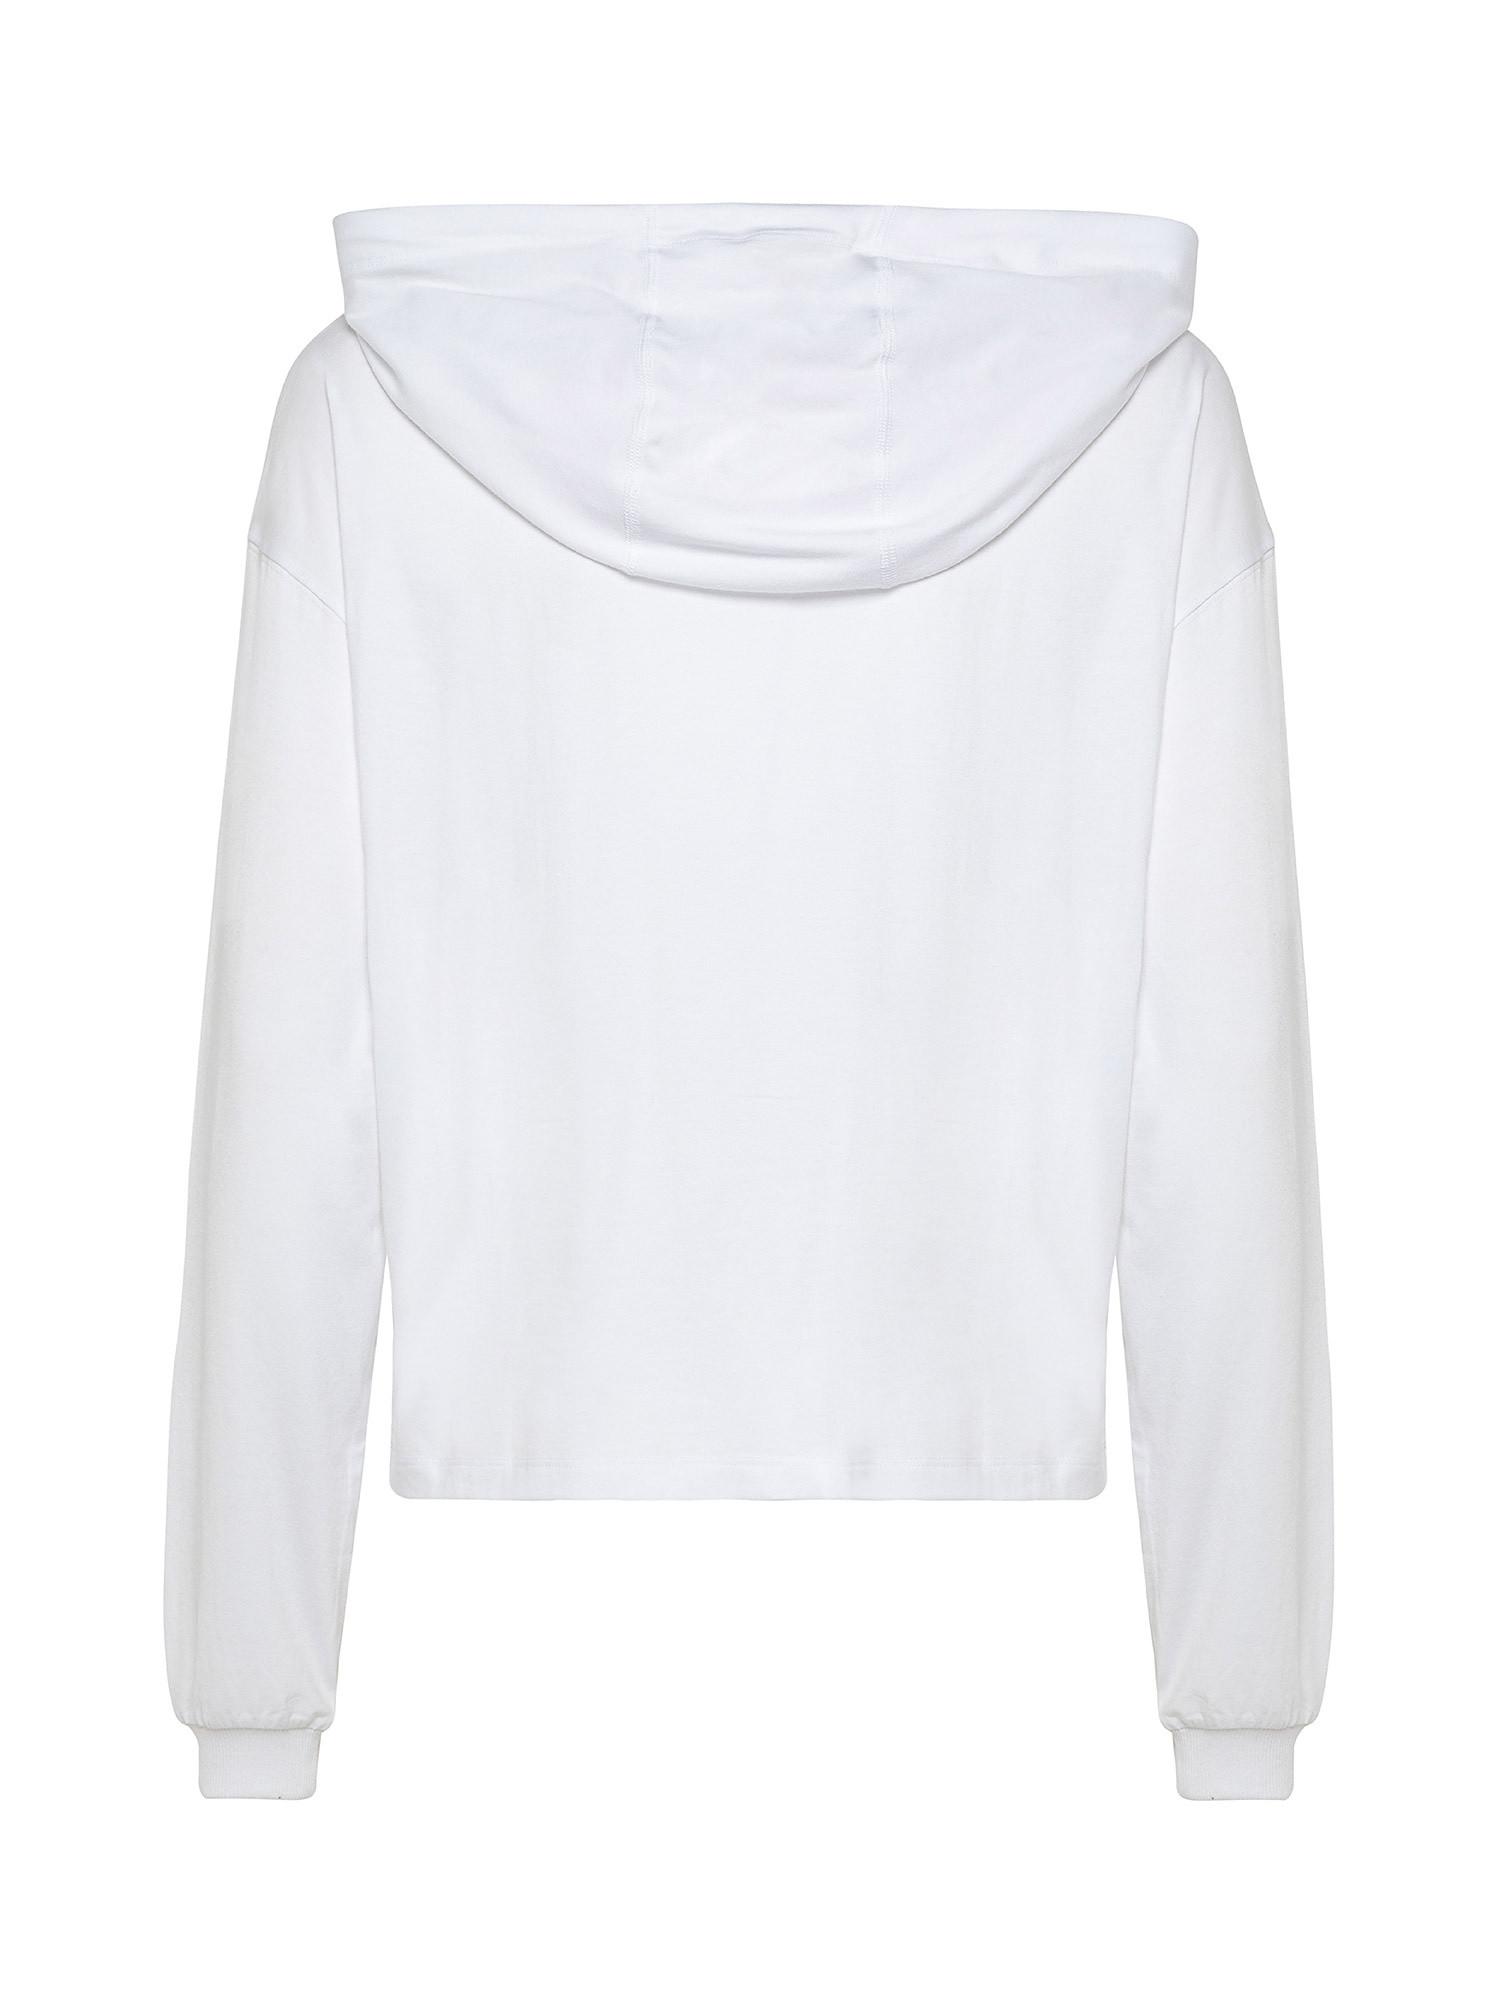 Pullover con giromanica abbassato, Bianco, large image number 1